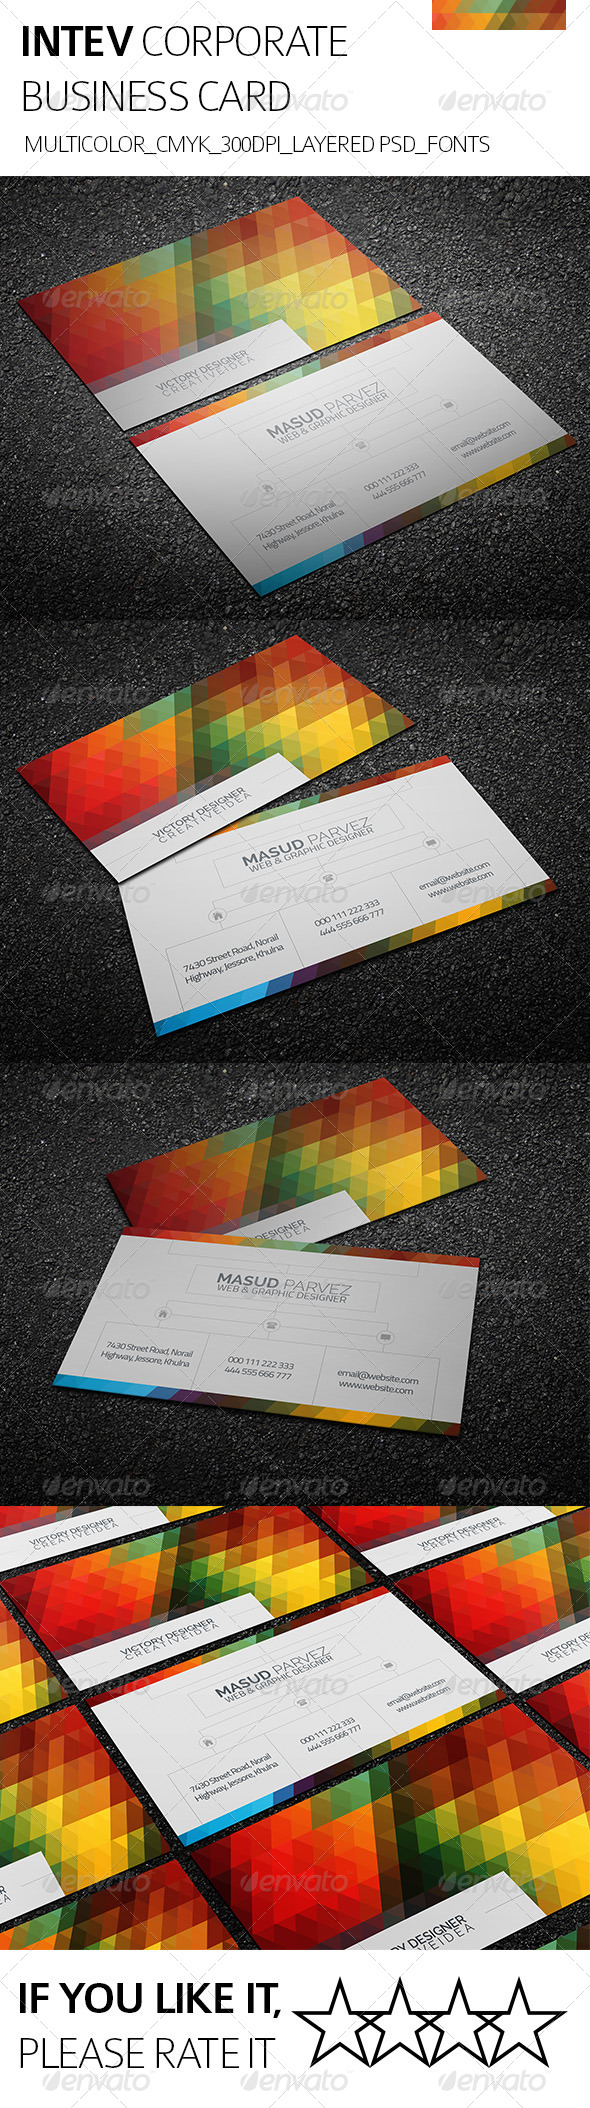 Intev & Corporate Business Card - Corporate Business Cards